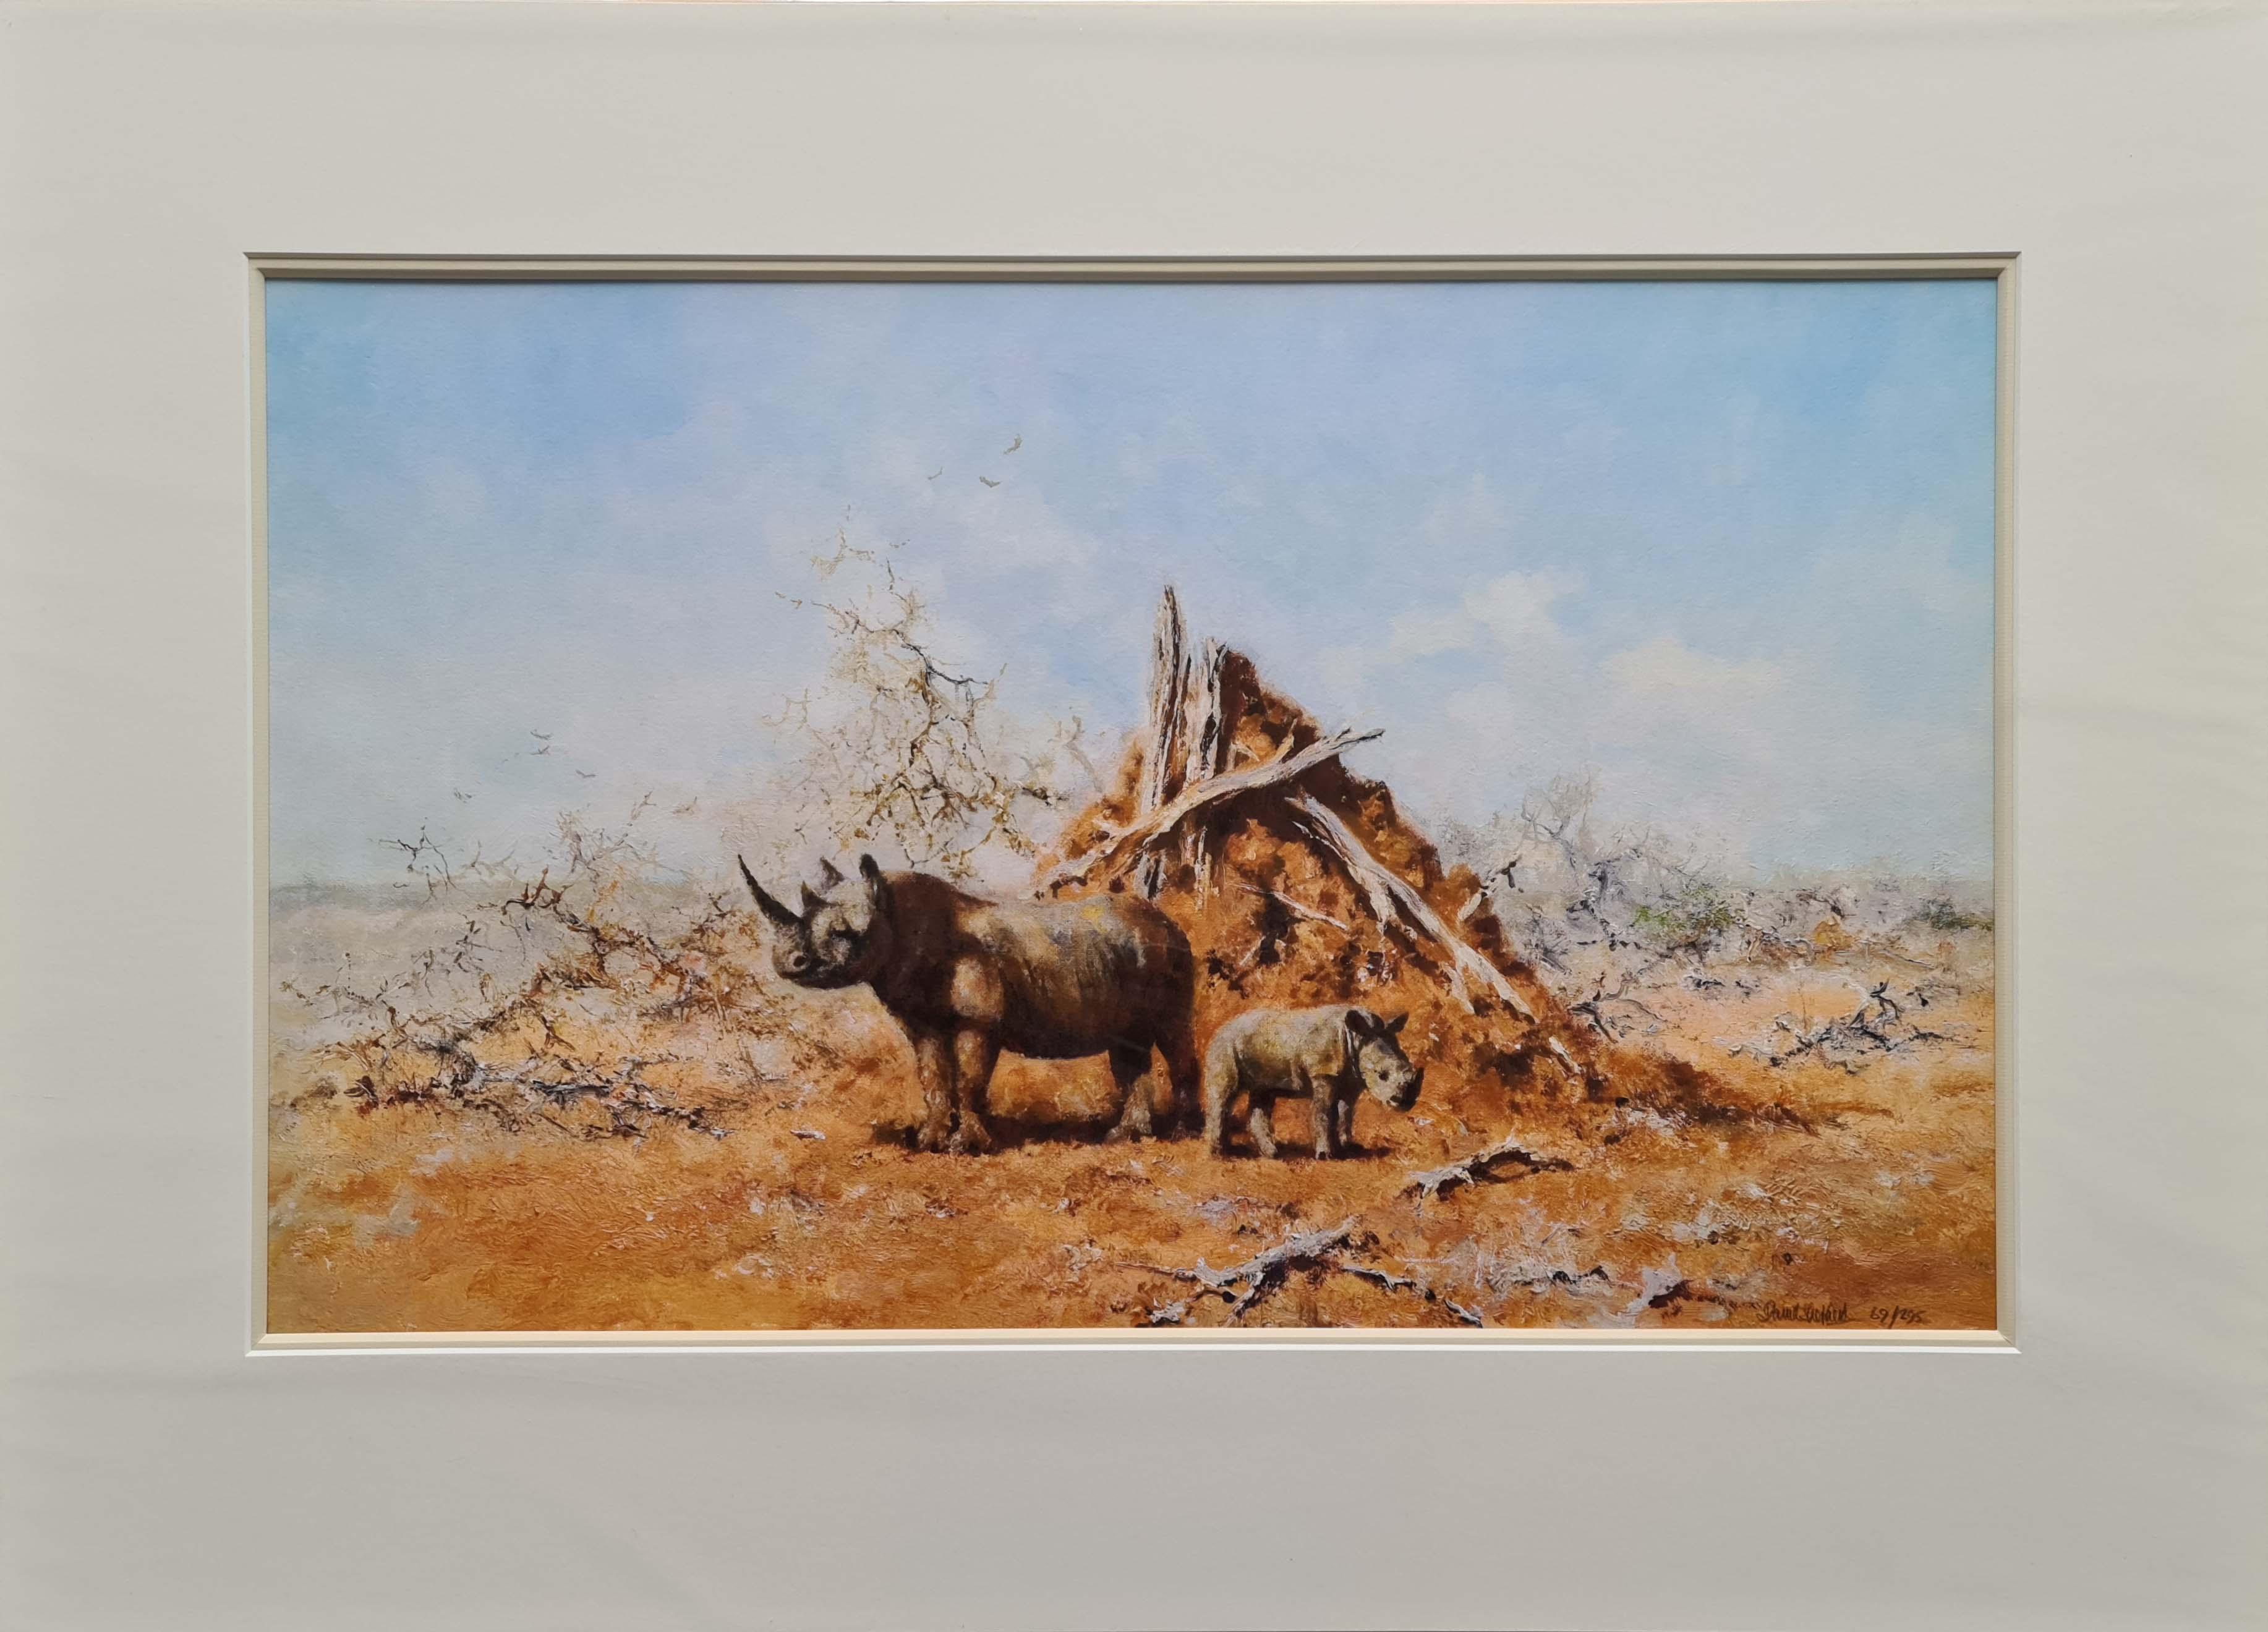 tsavo rhino david shepherd